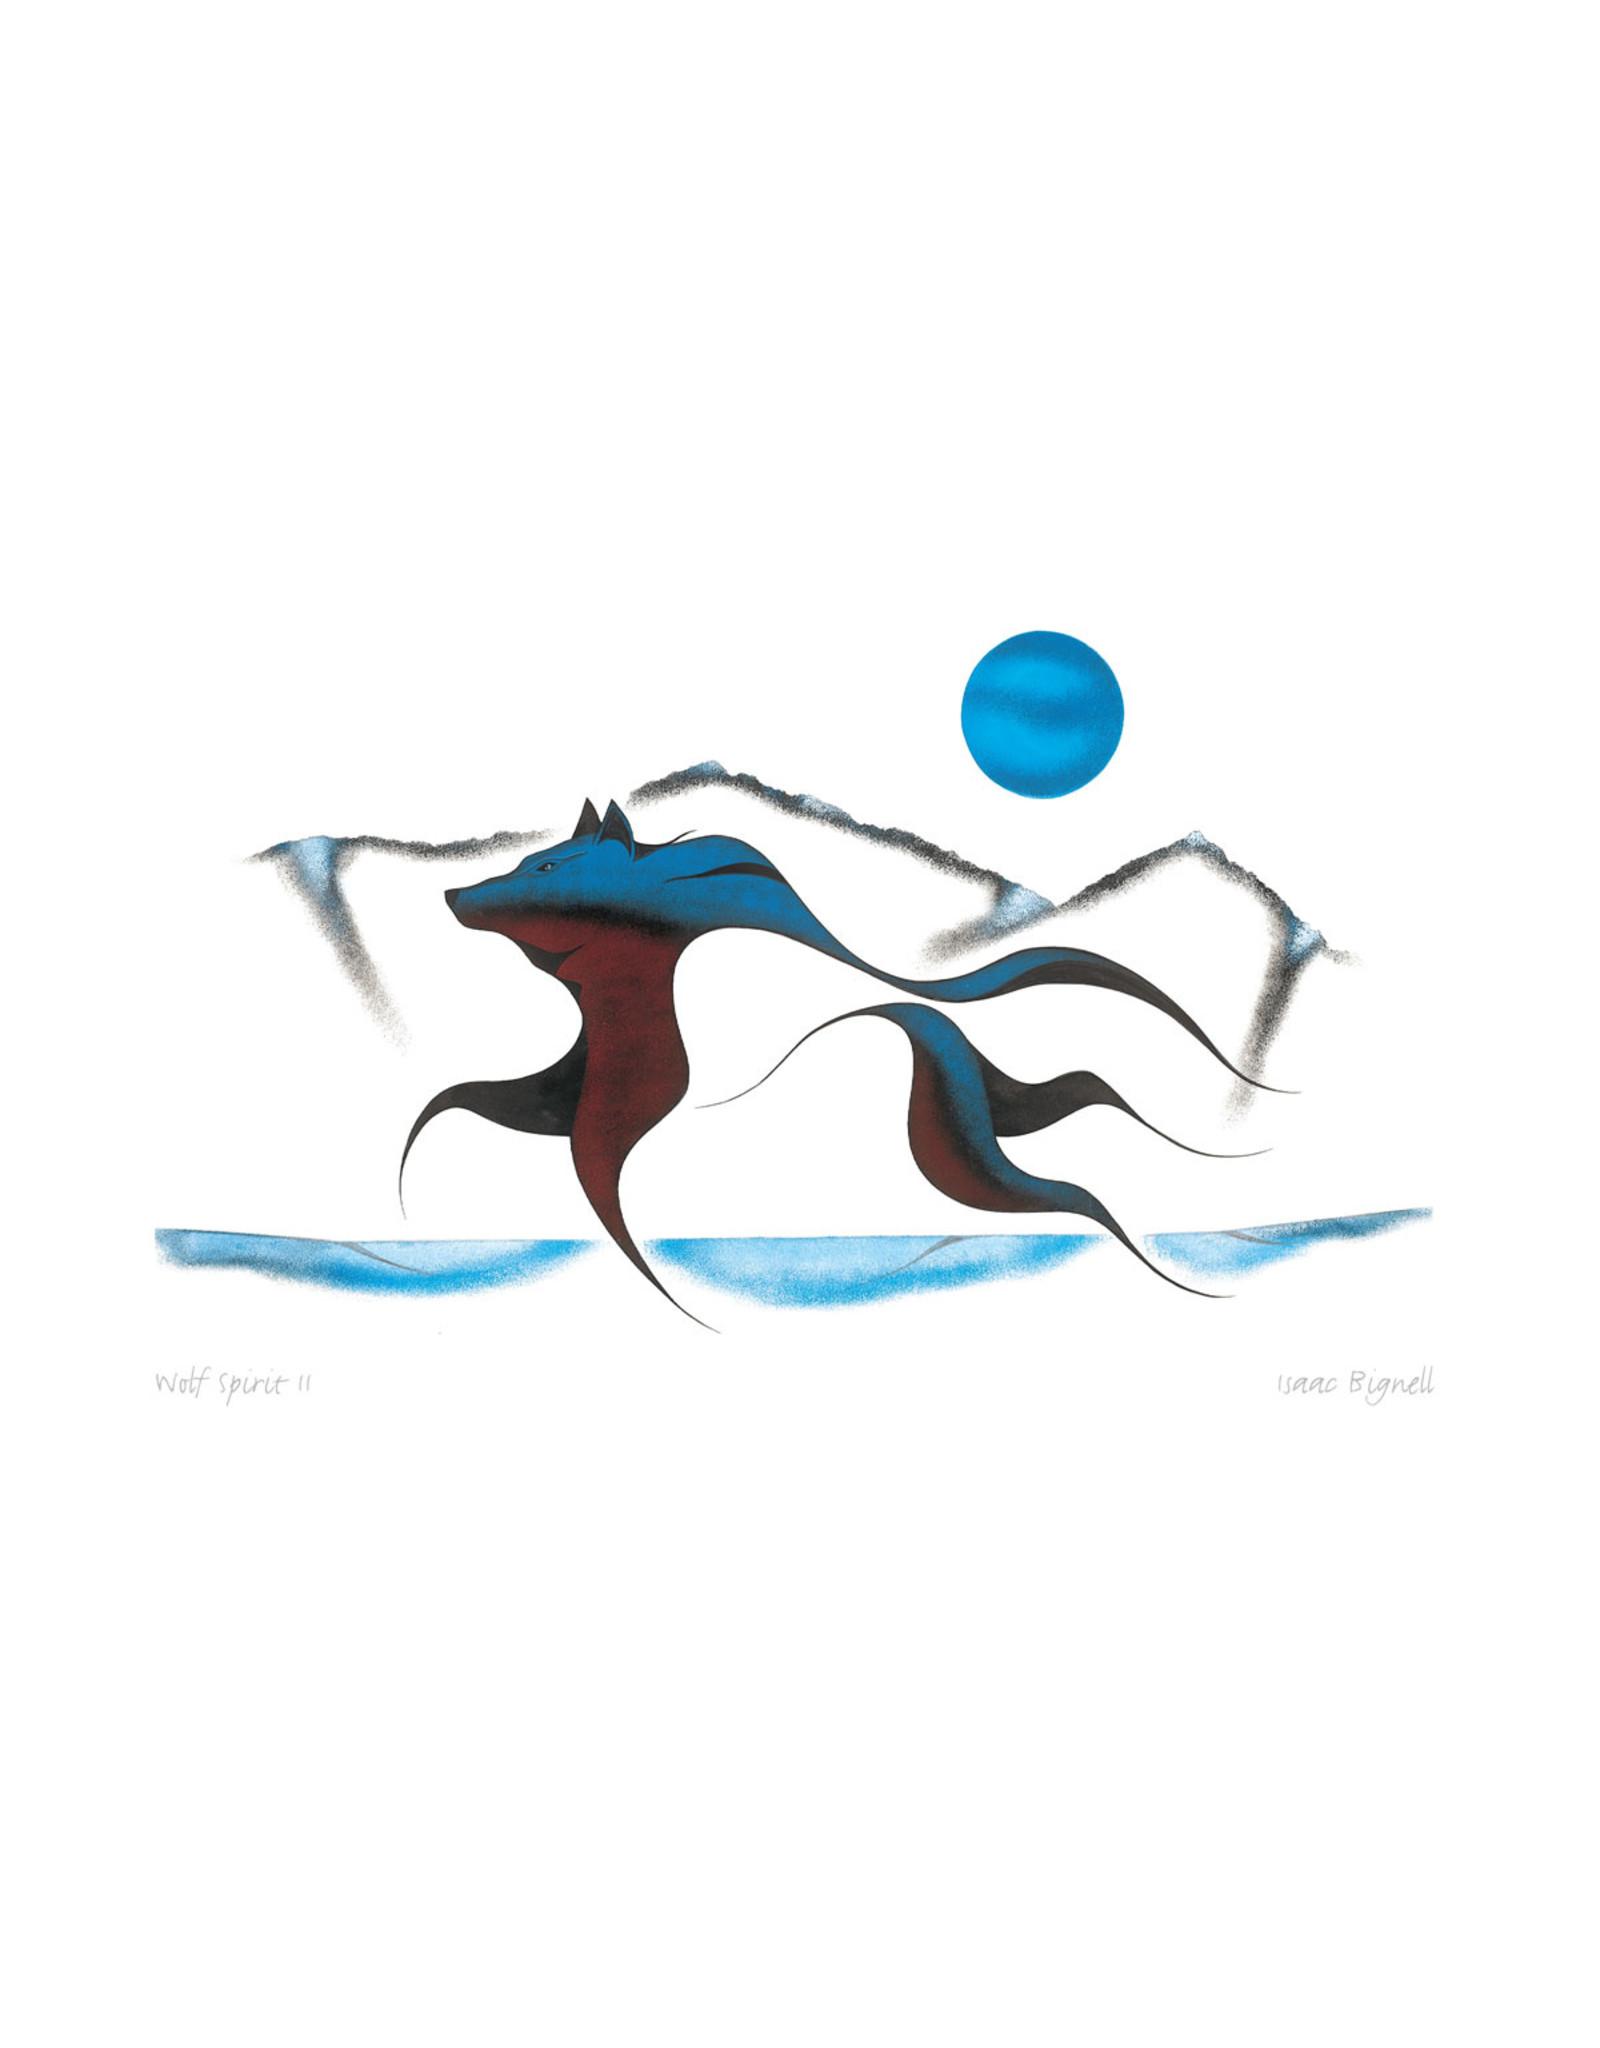 Wolf Spirit II by Isaac Bignell Card